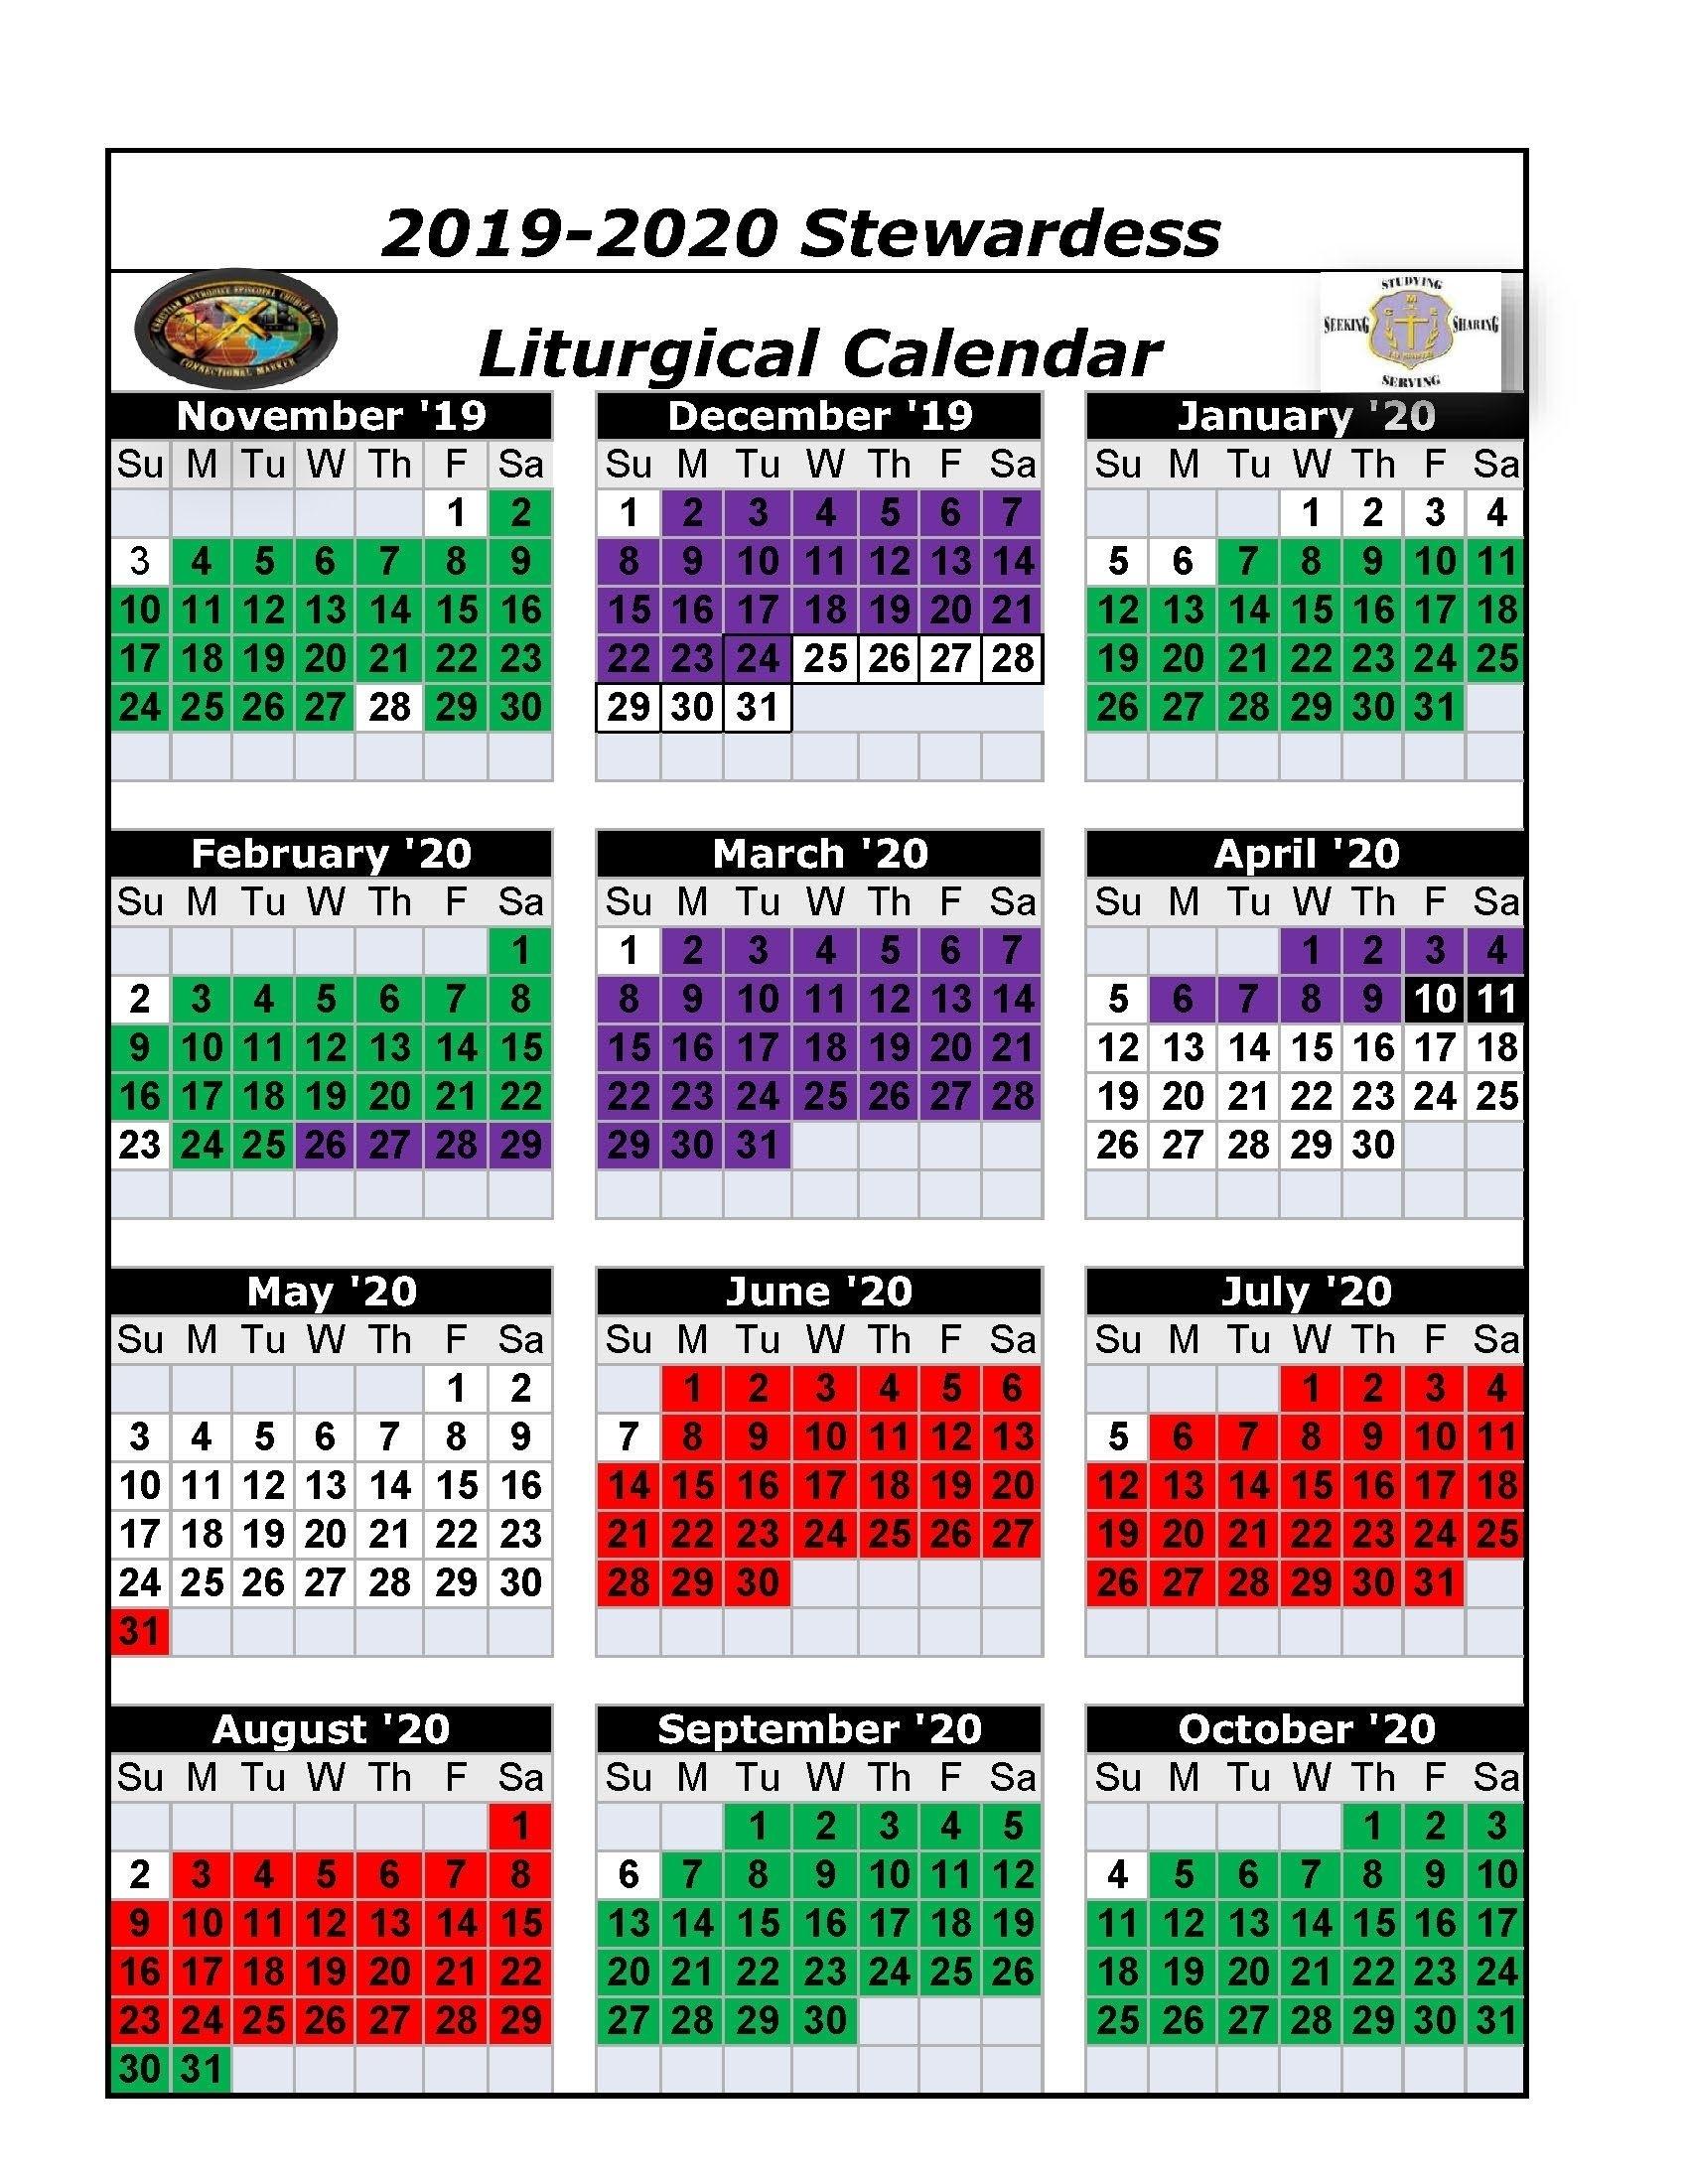 Elca Lutheran Church Calendar 2022.Liturgical Calendar 2021 Colors Churchpublishing Org Liturgical Ecalendar 2021 Where Homily Appears A Homily By Rev Lynnetten Fire